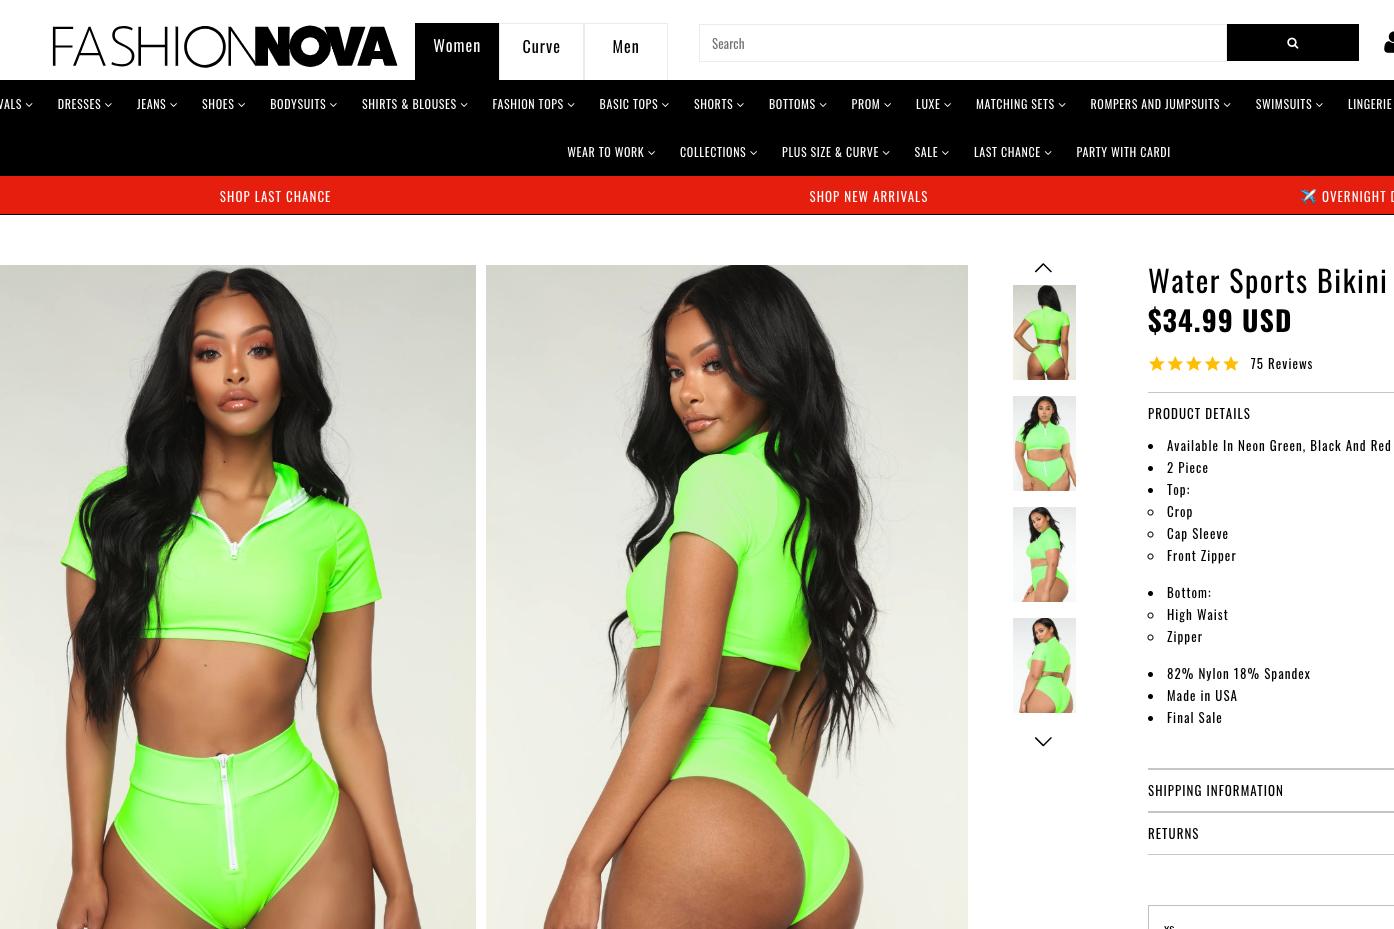 Fashion Nova swimwear comes with label warning ingredients